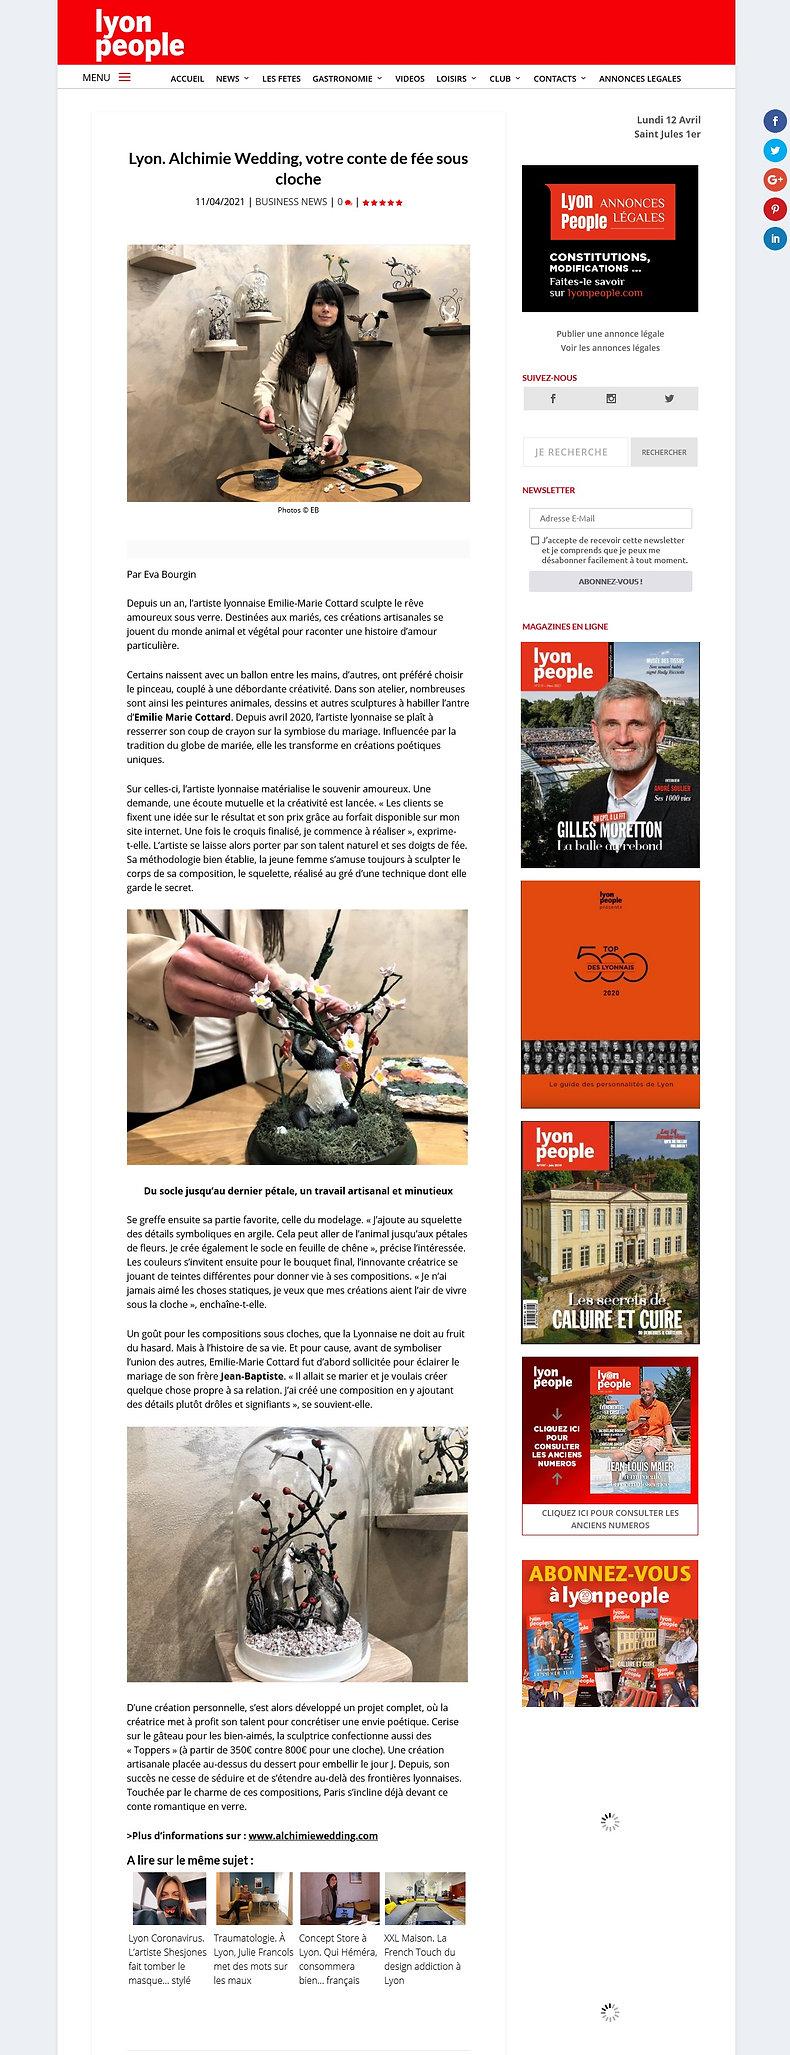 Article Lyon people Alchimi wedding coup